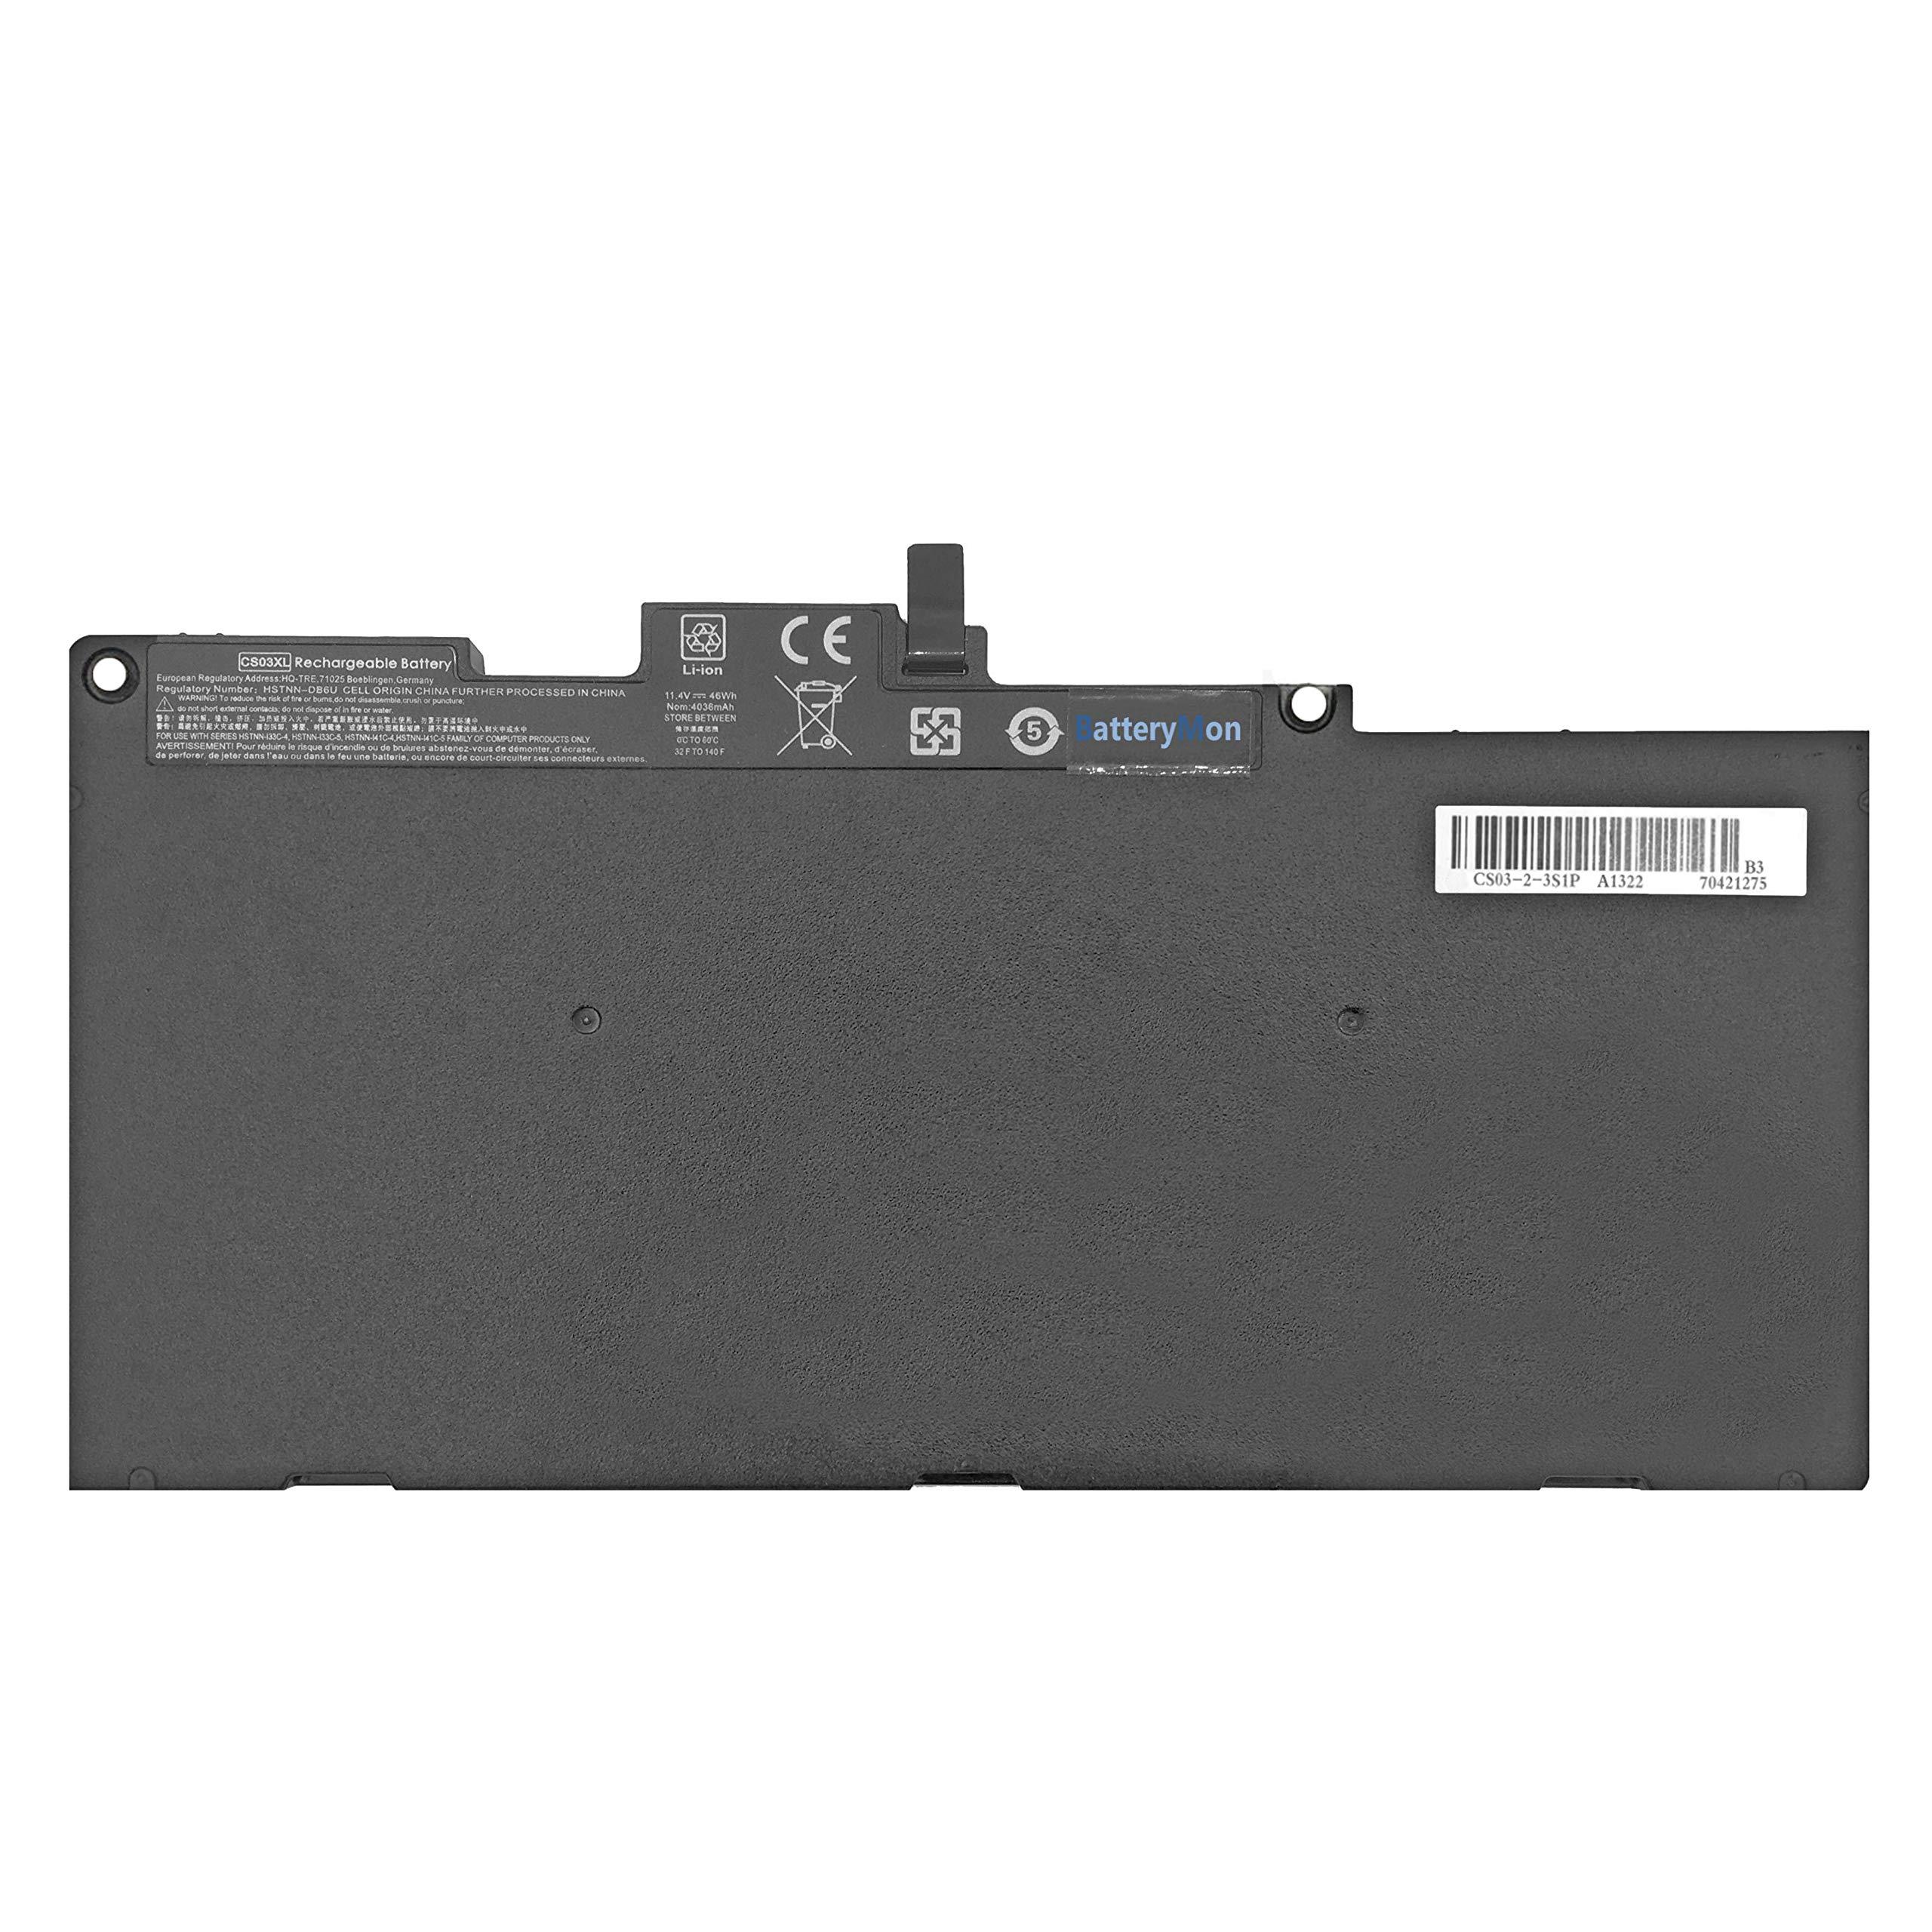 BatteryMon Battery CS03XL for HP Elitebook 745/755 / 840/848 / 850 G3 Laptop, P/N: HSTNN-UB6S HSTNN-IB6Y 800231-141 800513-001